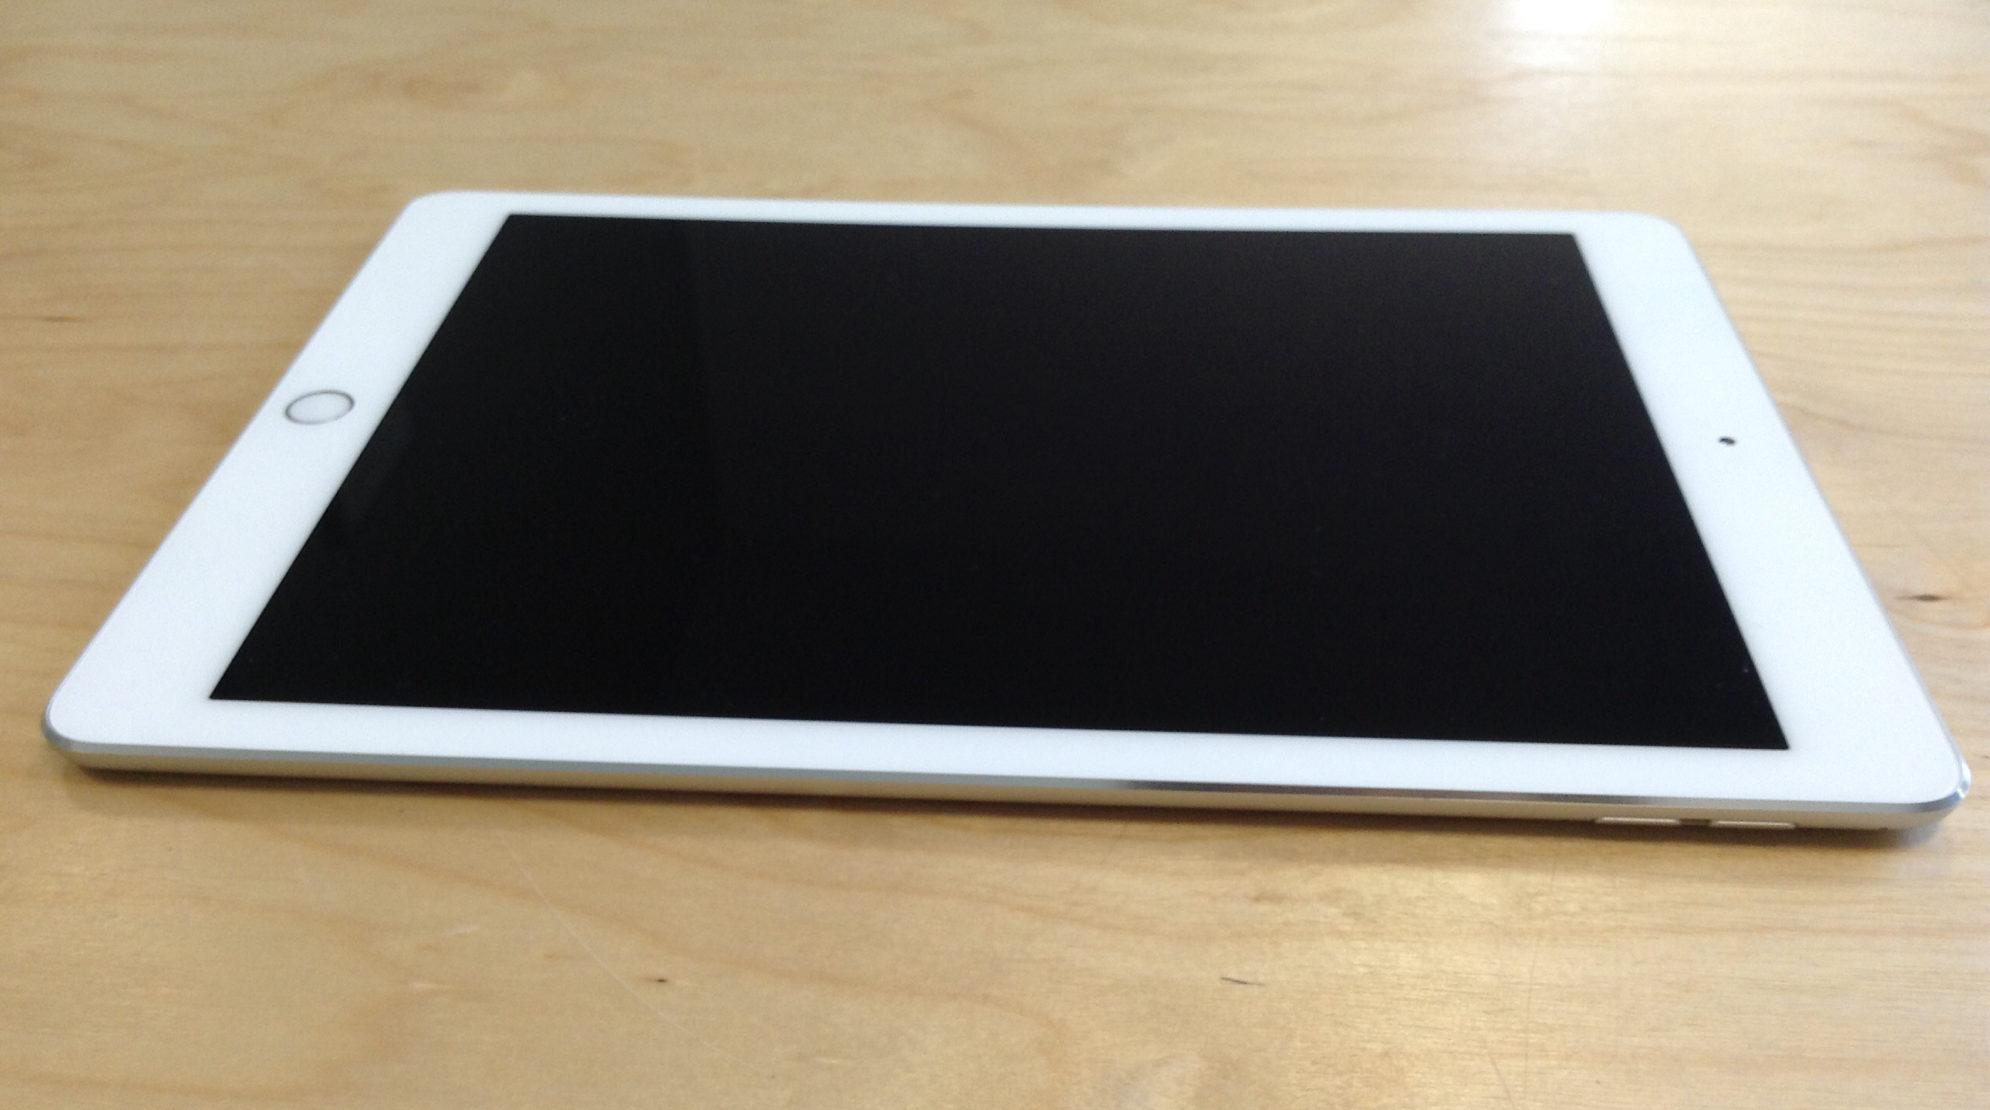 iPad Pro 9.7-inch (Wi-Fi), 128 GB, Gold, imagen 4